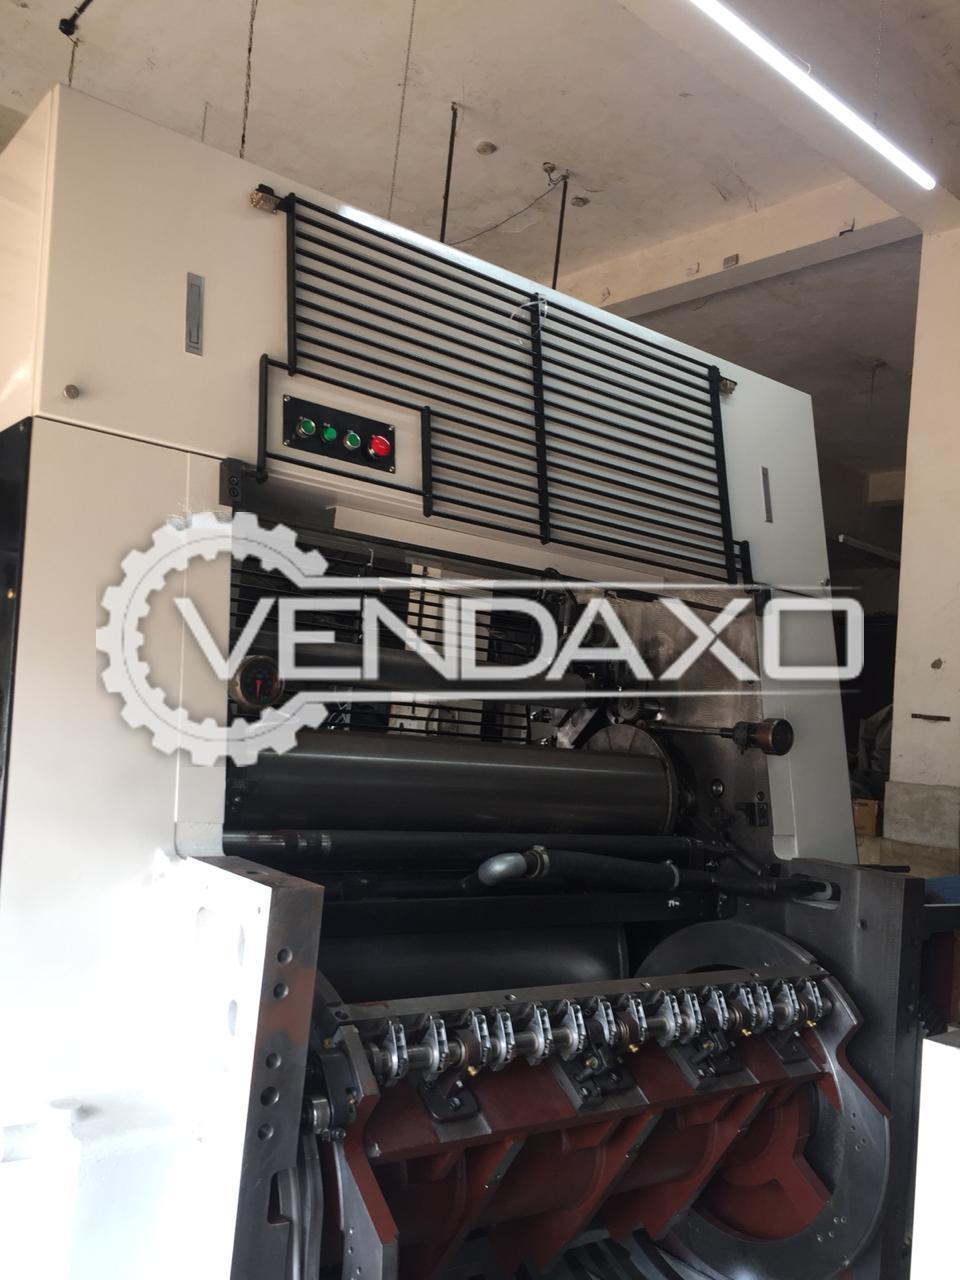 Mitsubishi 4E Offset Printing Machine - 4 Color, 1989 Model